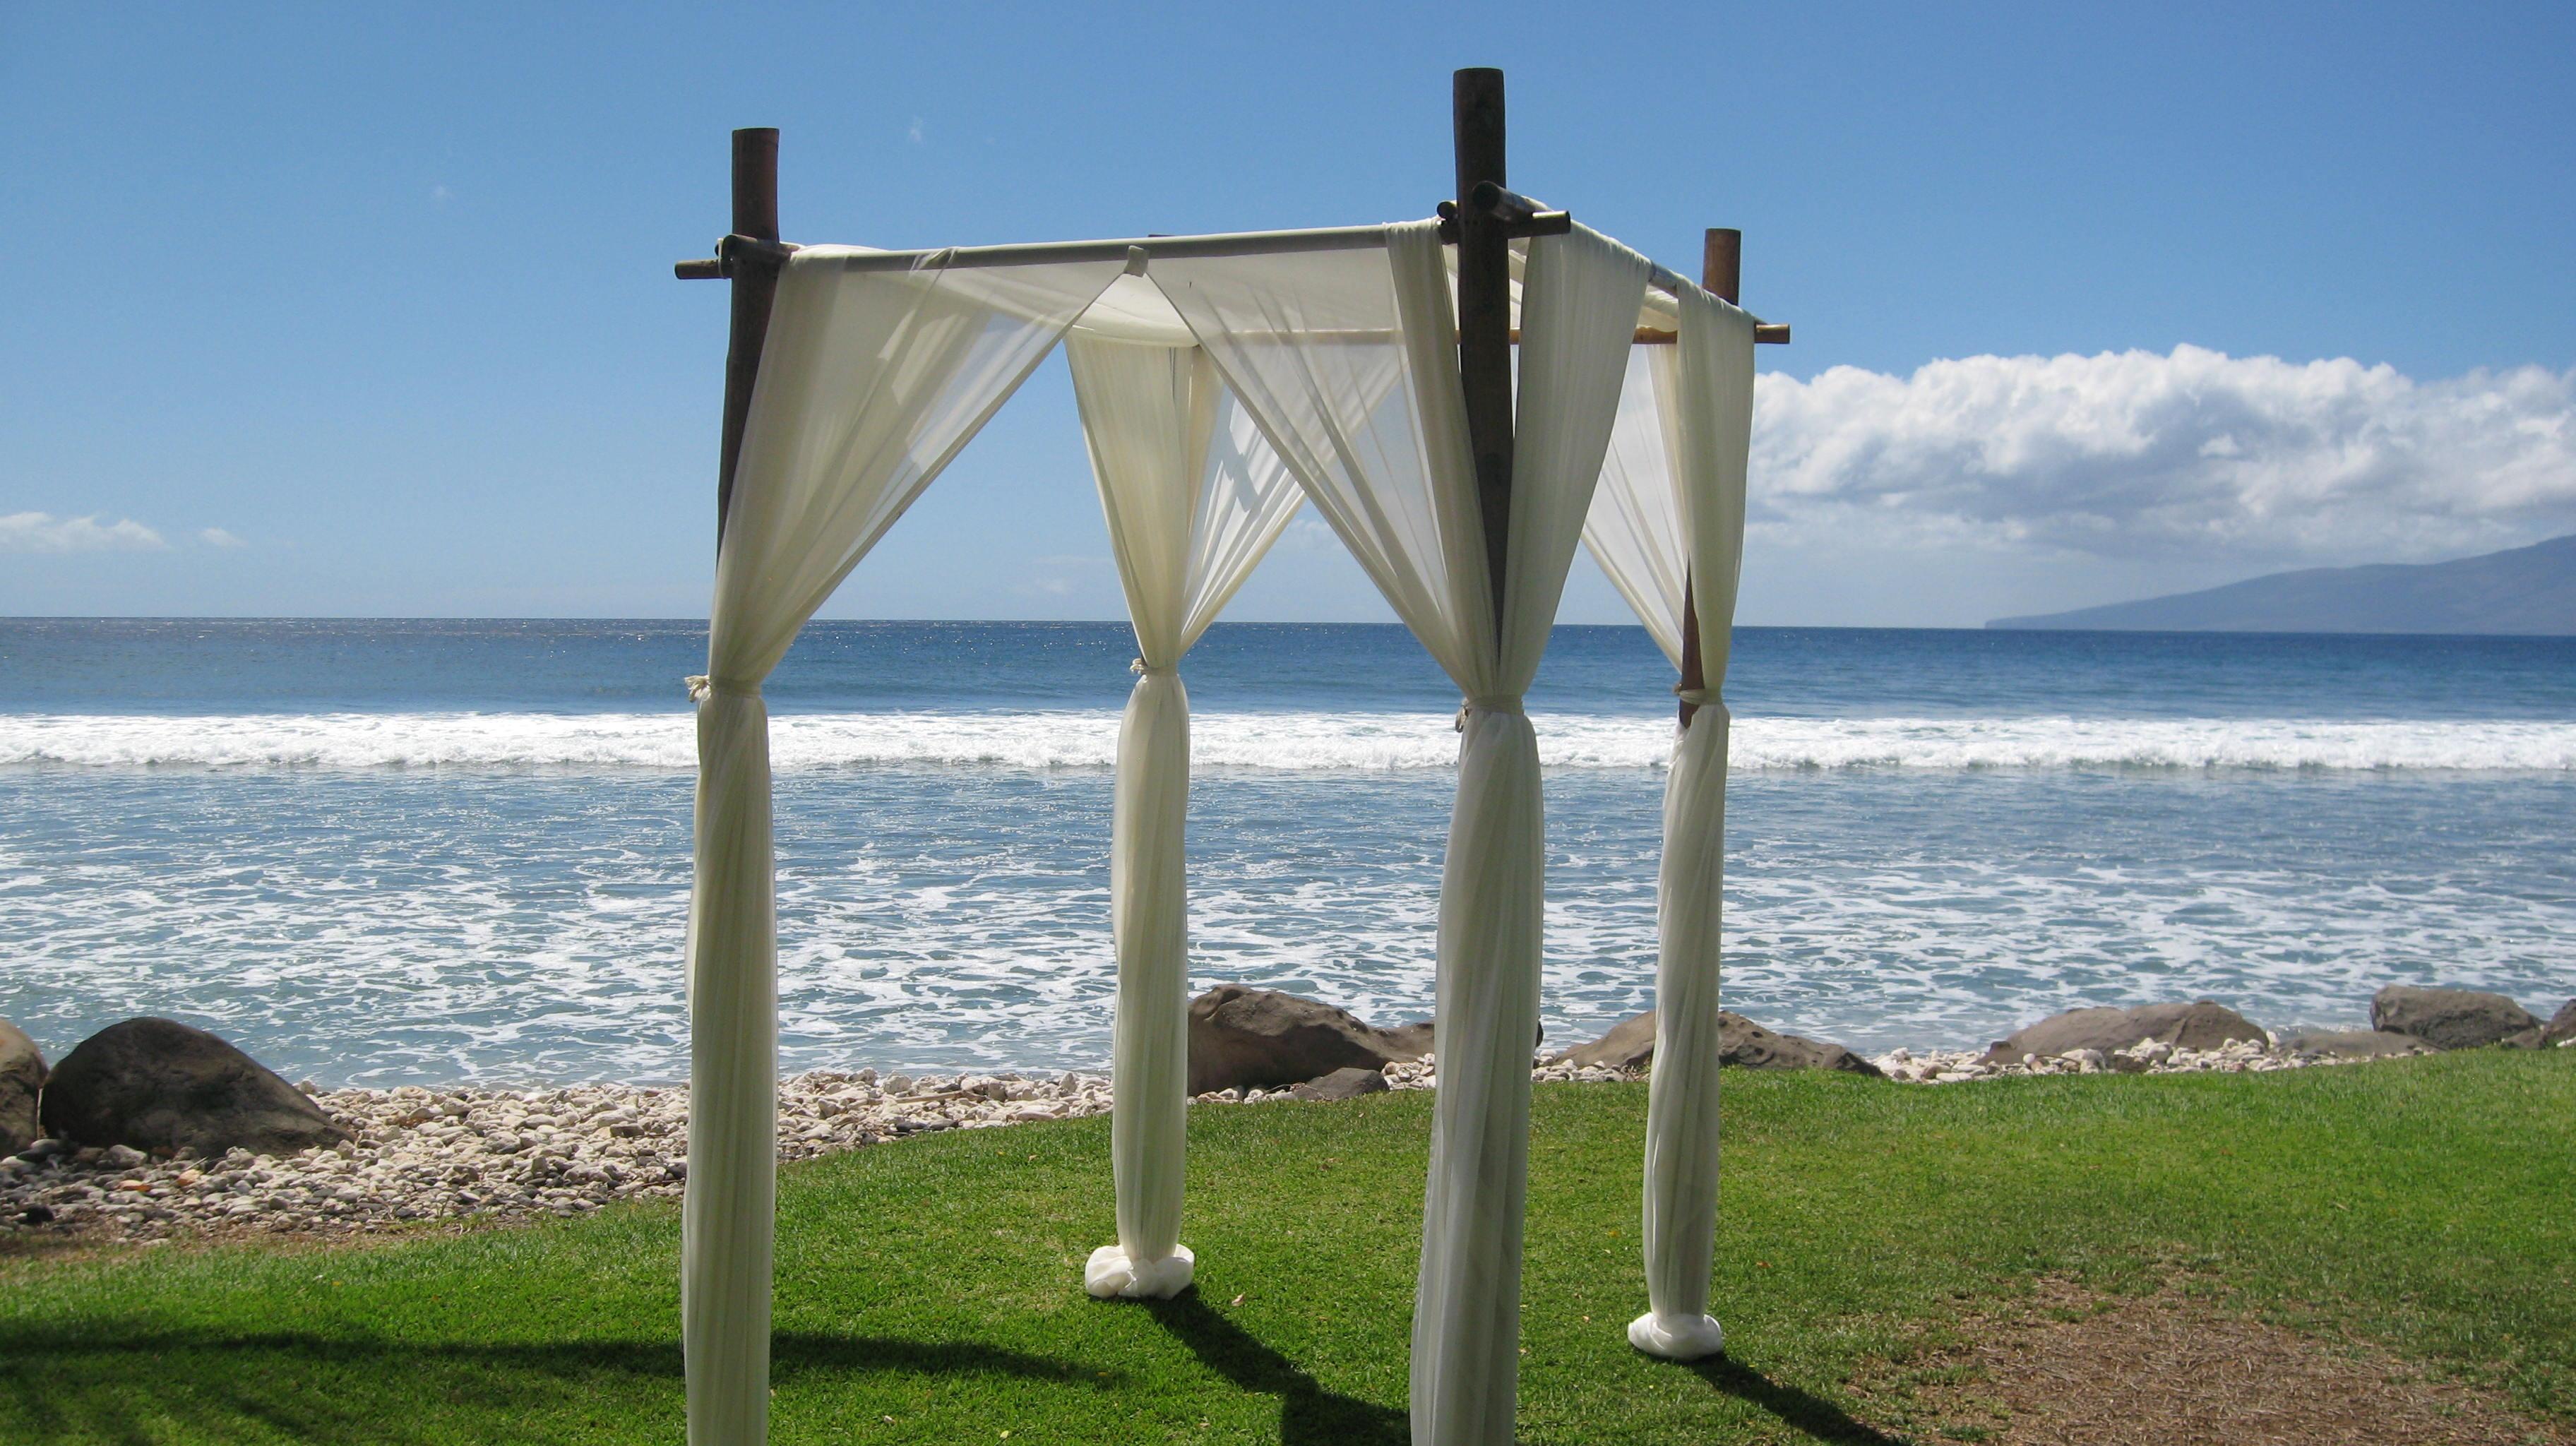 wedding chair covers hawaii amazon kneeling traveltomaui's blog   just another wordpress.com weblog